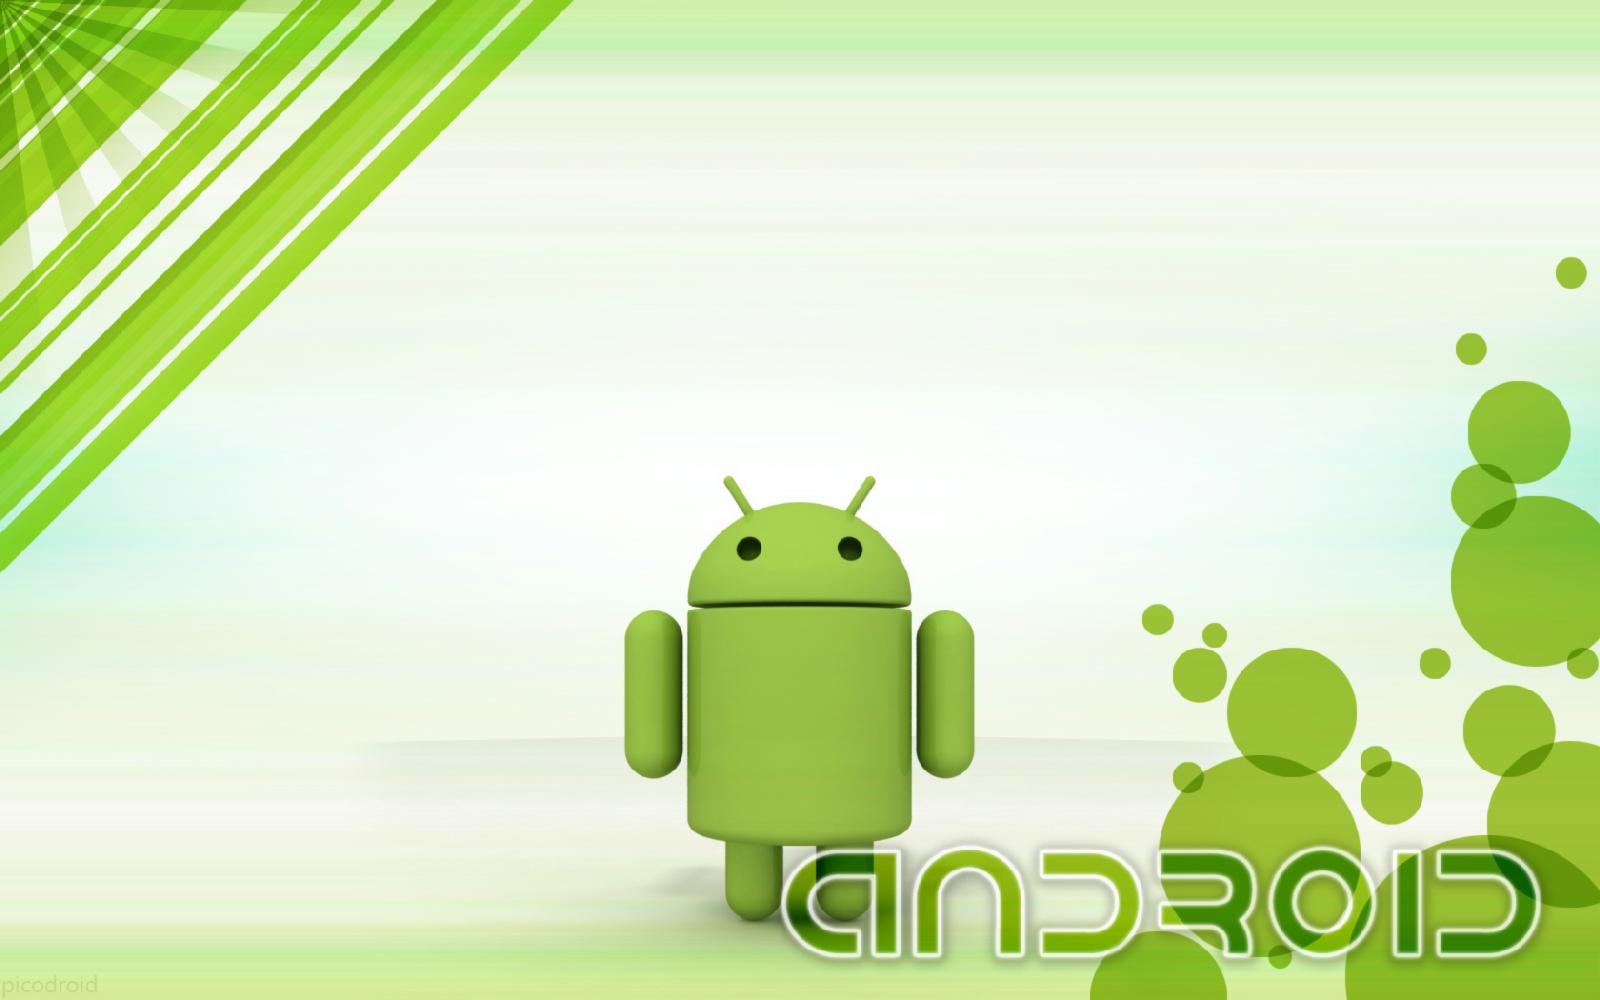 http://1.bp.blogspot.com/-jm0LXIv4tJY/UD0-pjkor1I/AAAAAAAAKas/Ry4vk99JB9A/s1600/Android_nice_vector.jpg